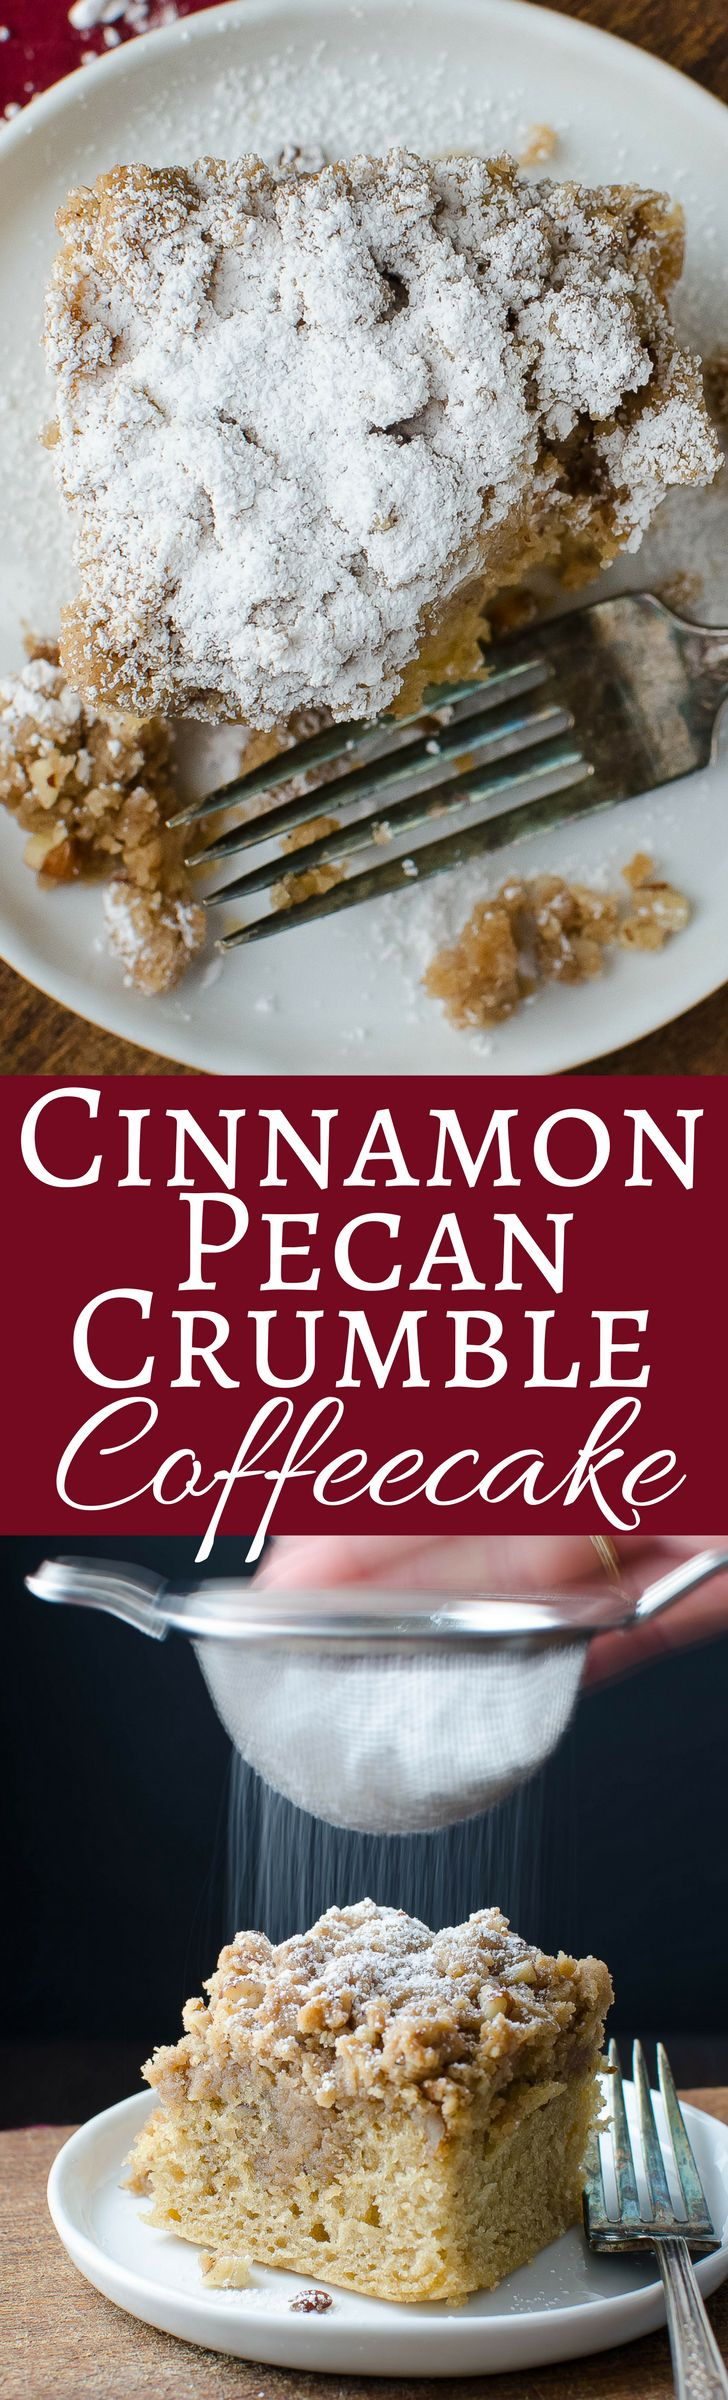 Cinnamon Pecan Crumble Coffee Cake